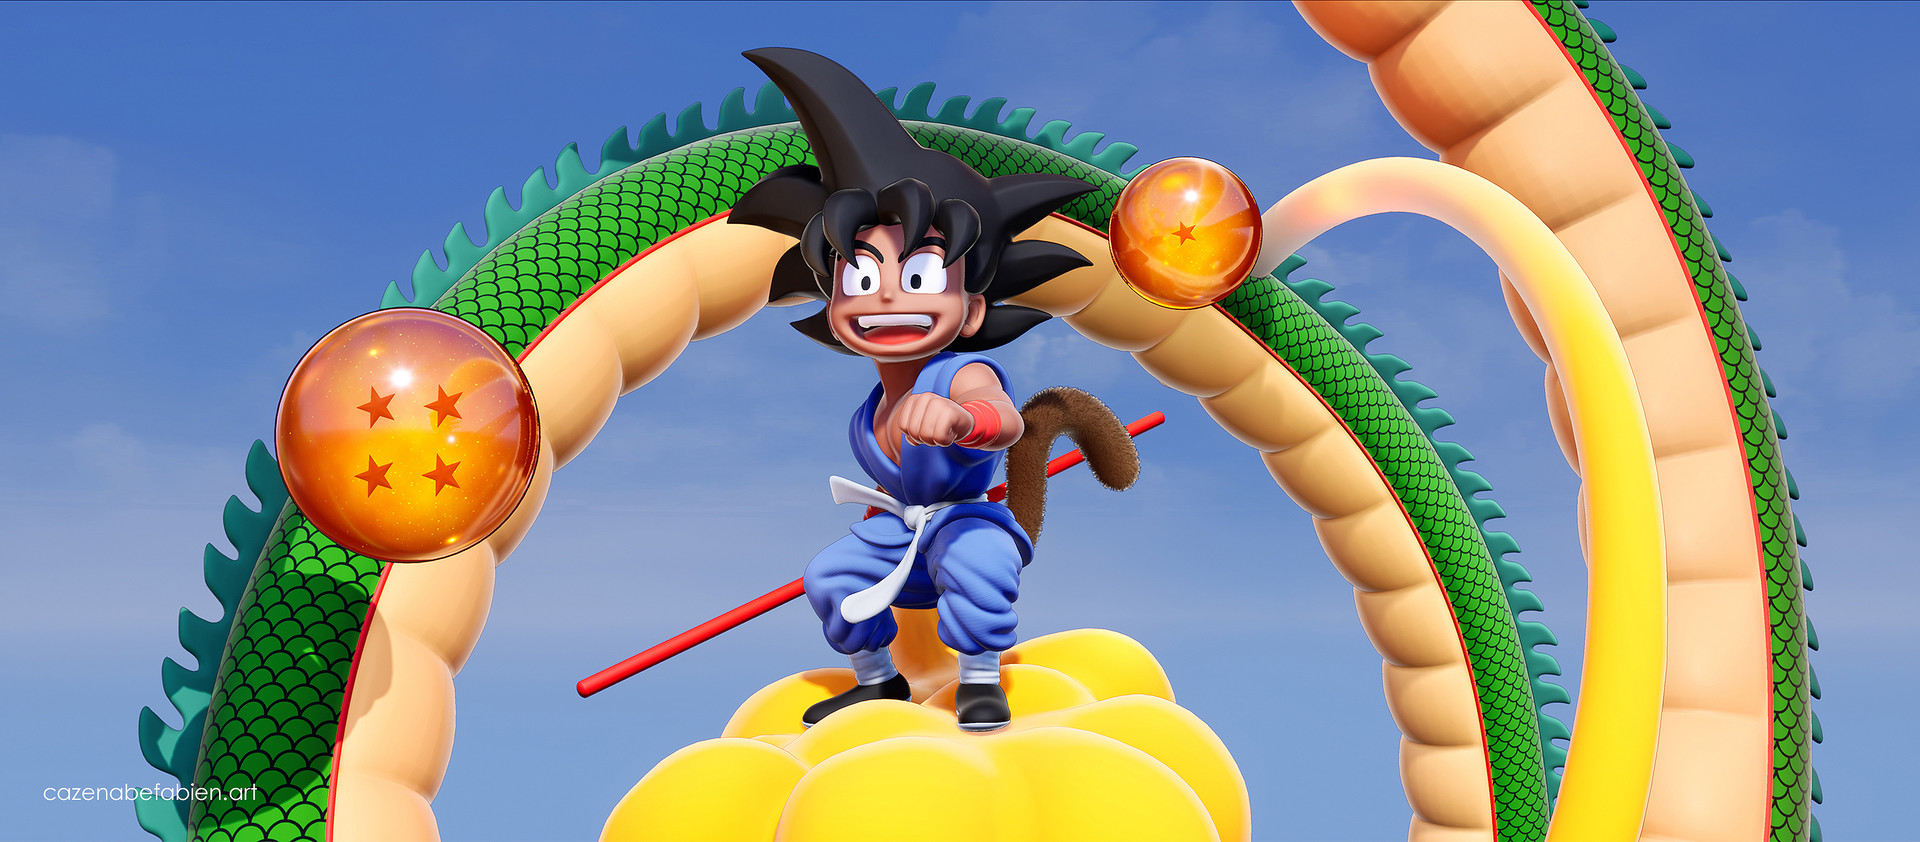 Fabien cazenabe sangoku dragon ball sculpt zbrush unreal 3d 09